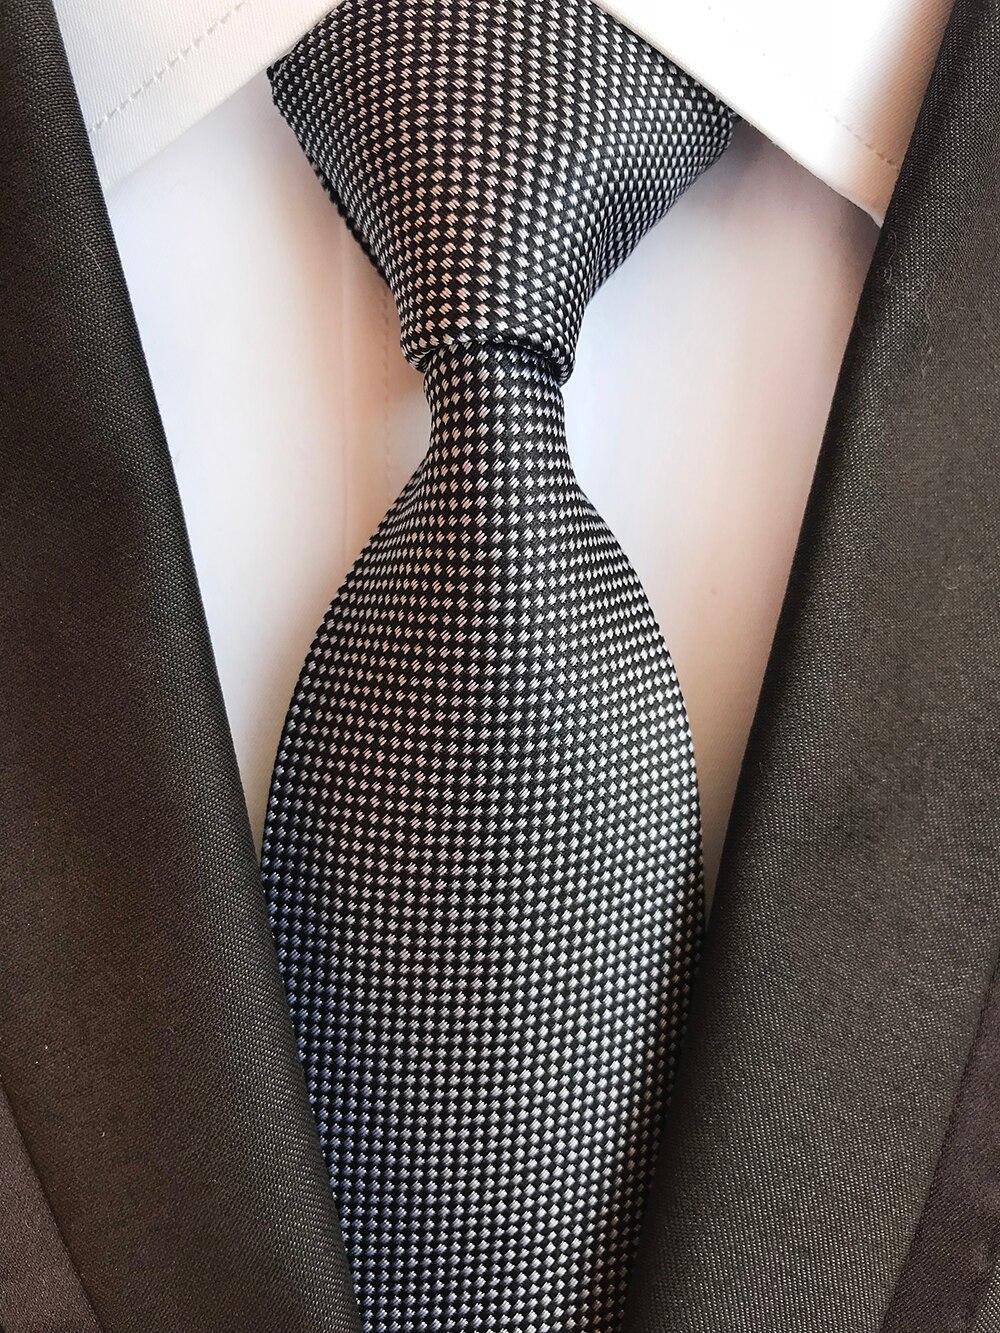 Classic 8cm Ties for Man 100% Silk Tie Luxury Striped Plaid Checks Business Neck Tie for Men Suit Cravat Wedding Party Neckties 5